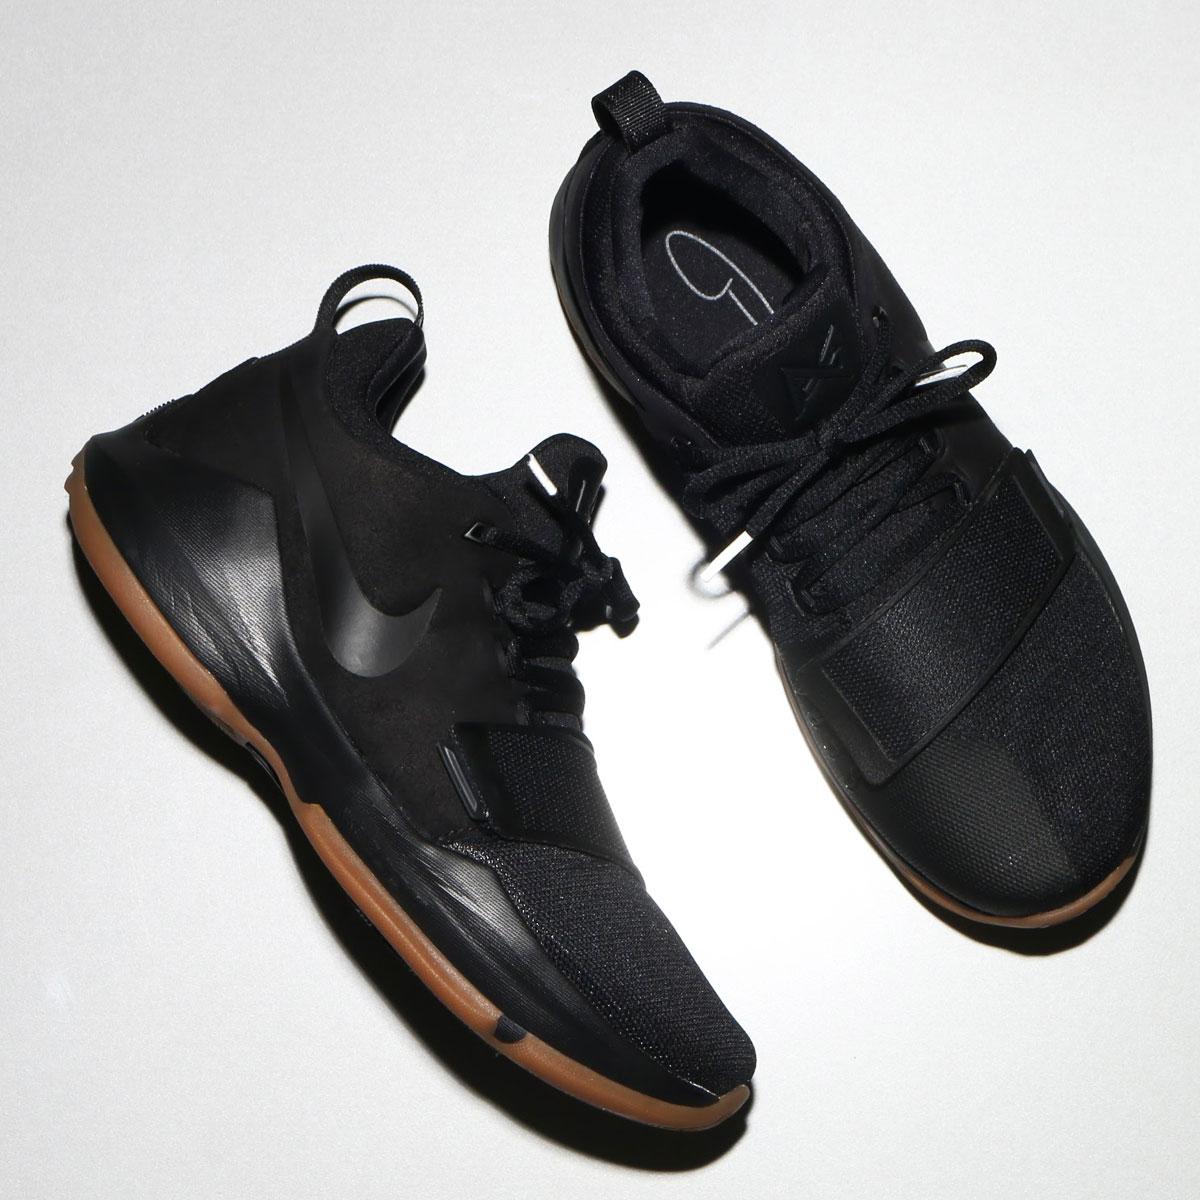 online store 07151 4fd28 NIKE PG 1 EP (Nike PG 1 EP) BLACK BLACK-ANTHRACITE- ...